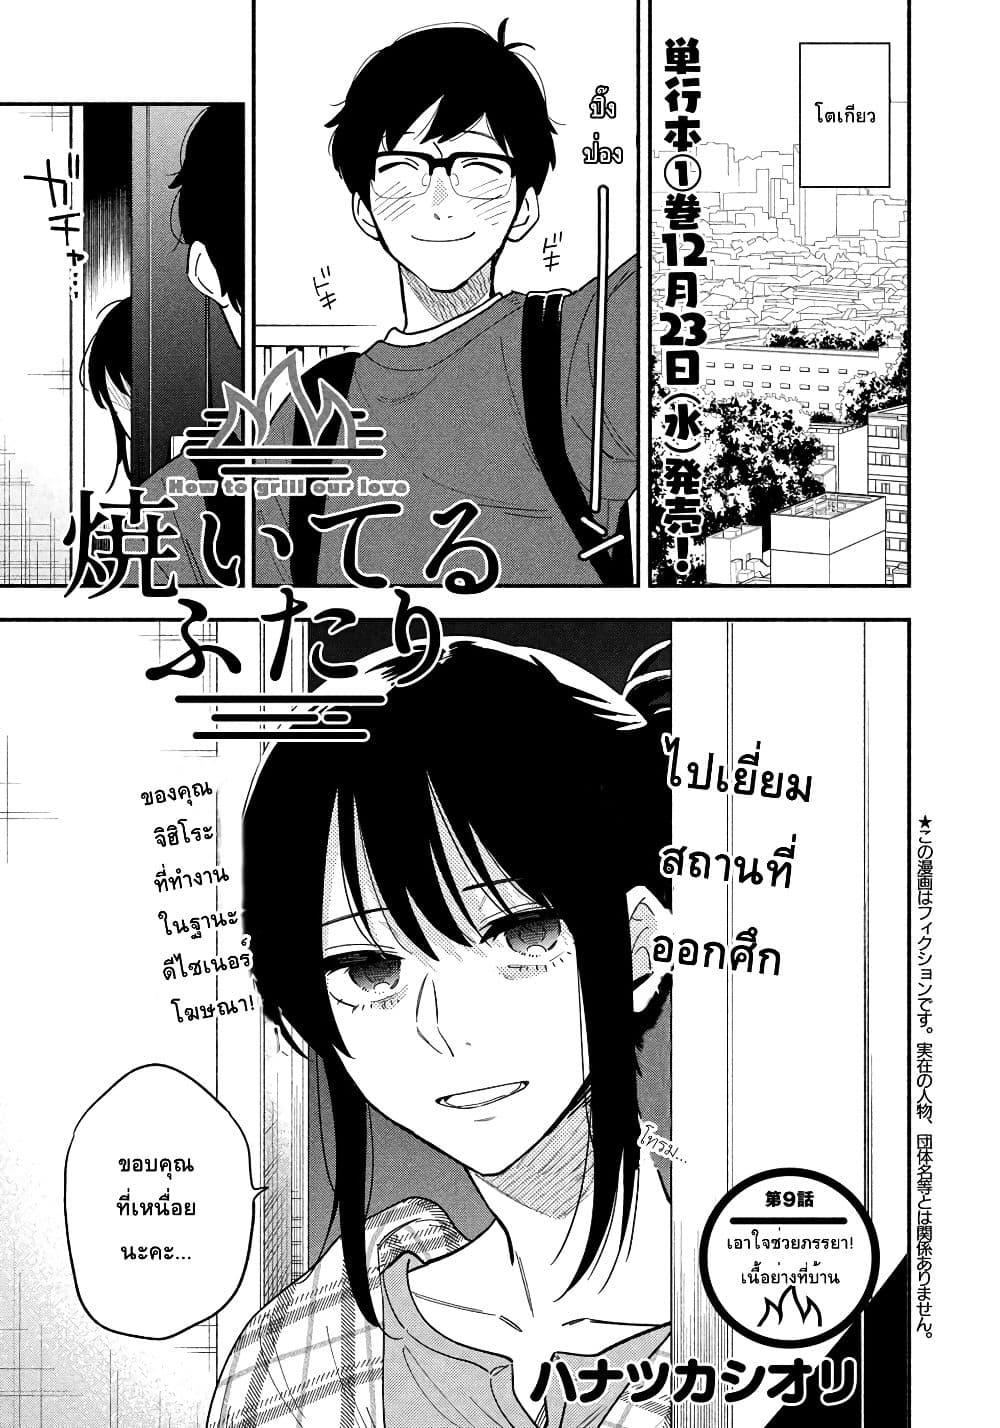 Yaiteru Futari-ตอนที่ 9